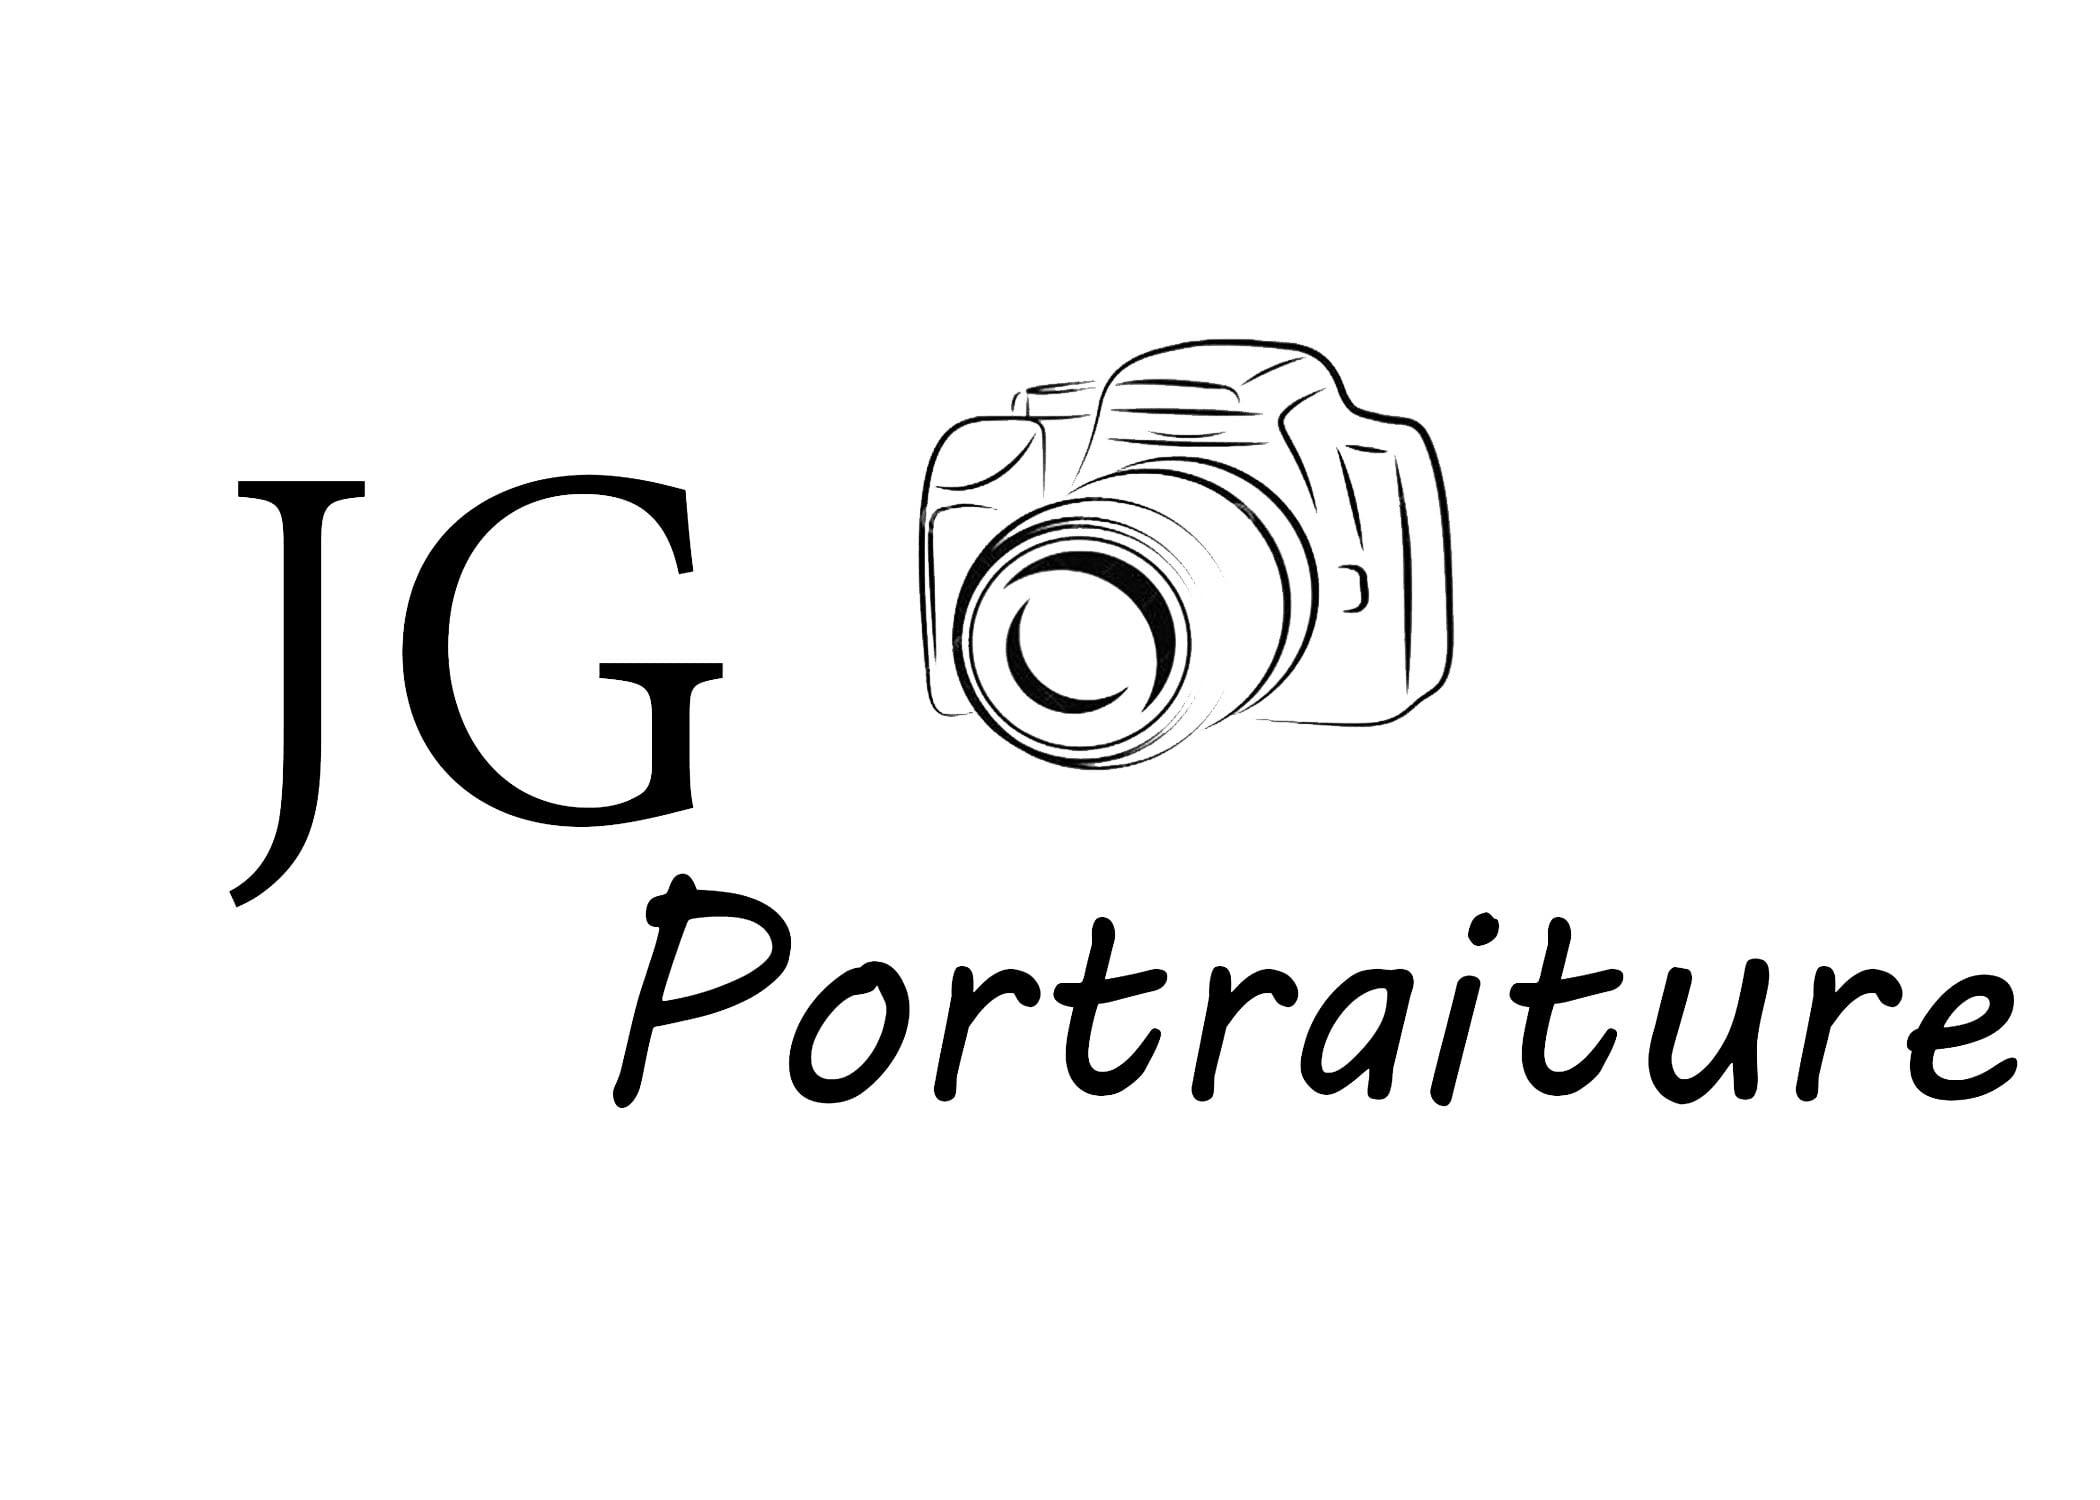 JG Portraiture